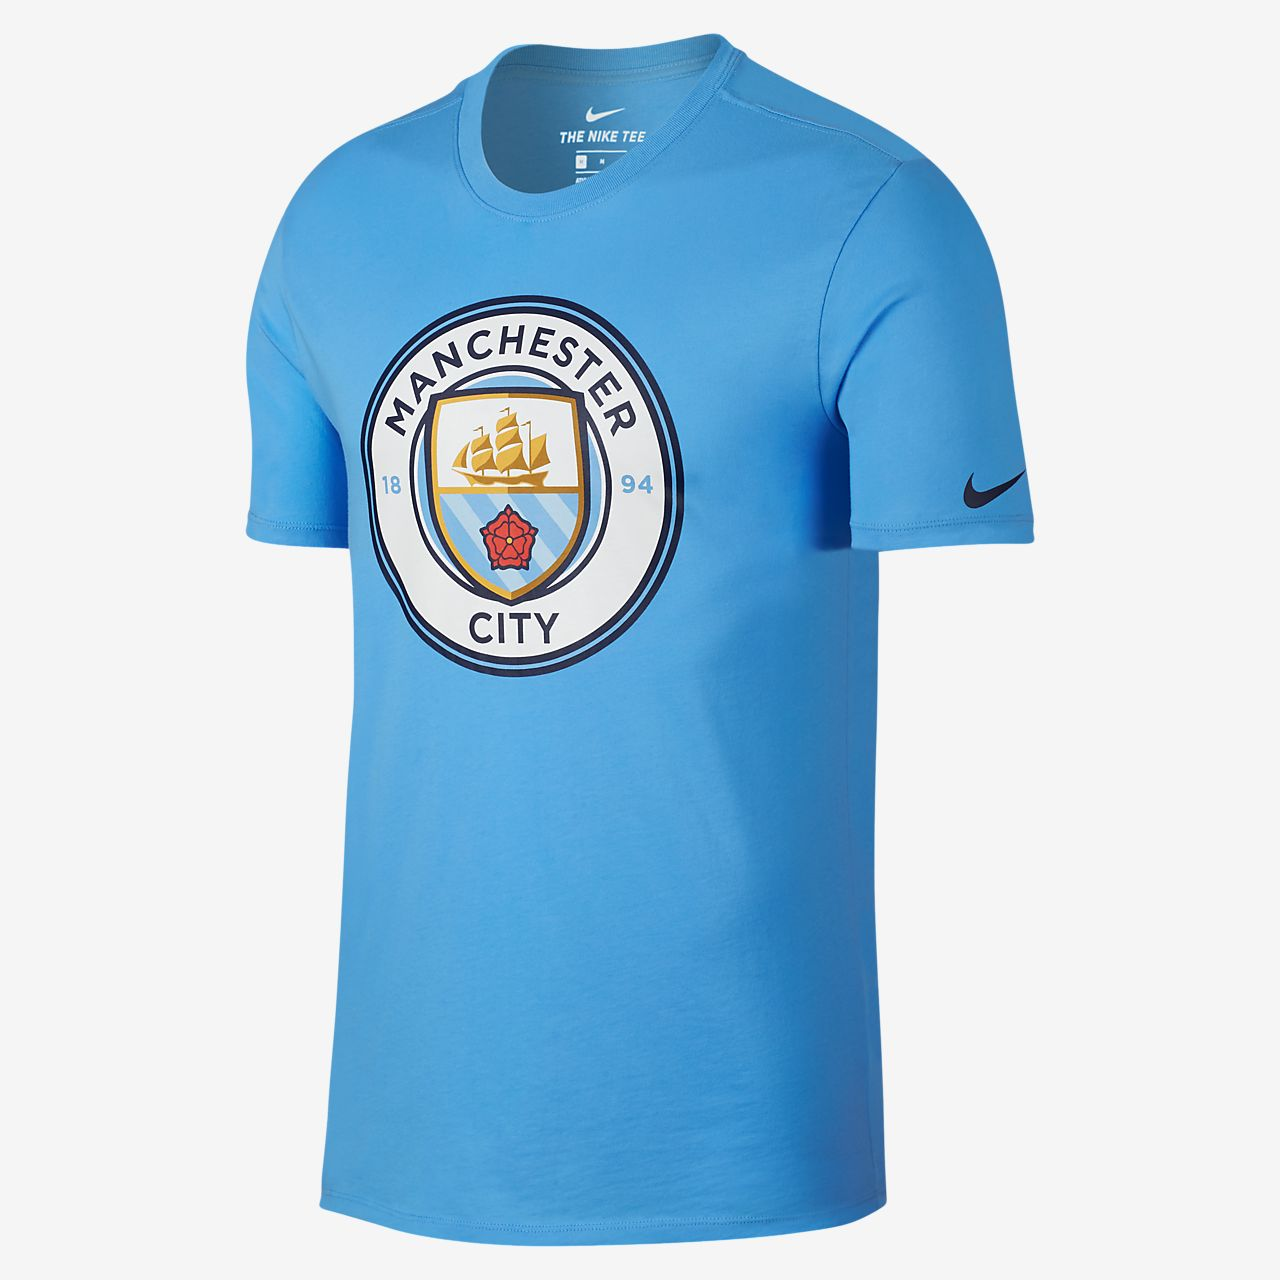 Camiseta para hombre Manchester City FC Crest. Nike.com MX f27bb622d1f